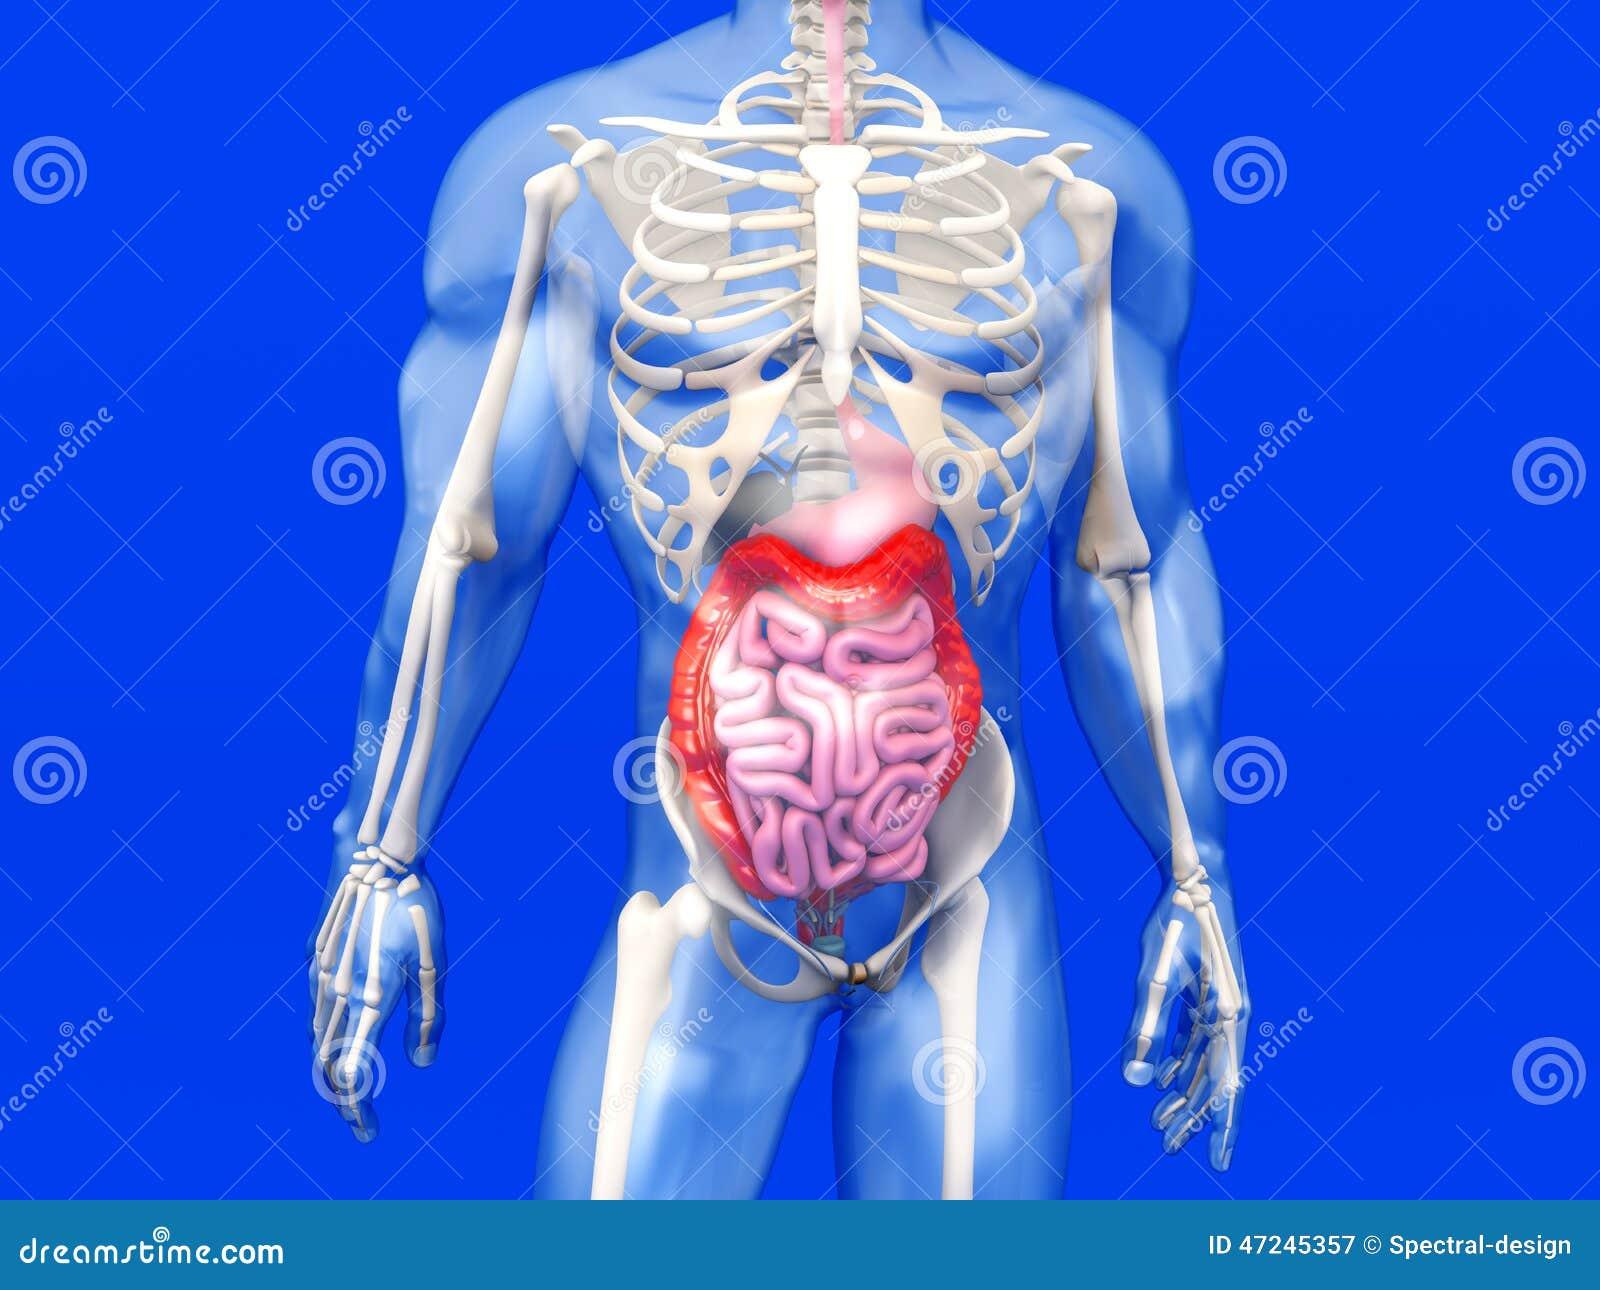 Human Anatomy Visualization - Digestive System Stock Illustration ...